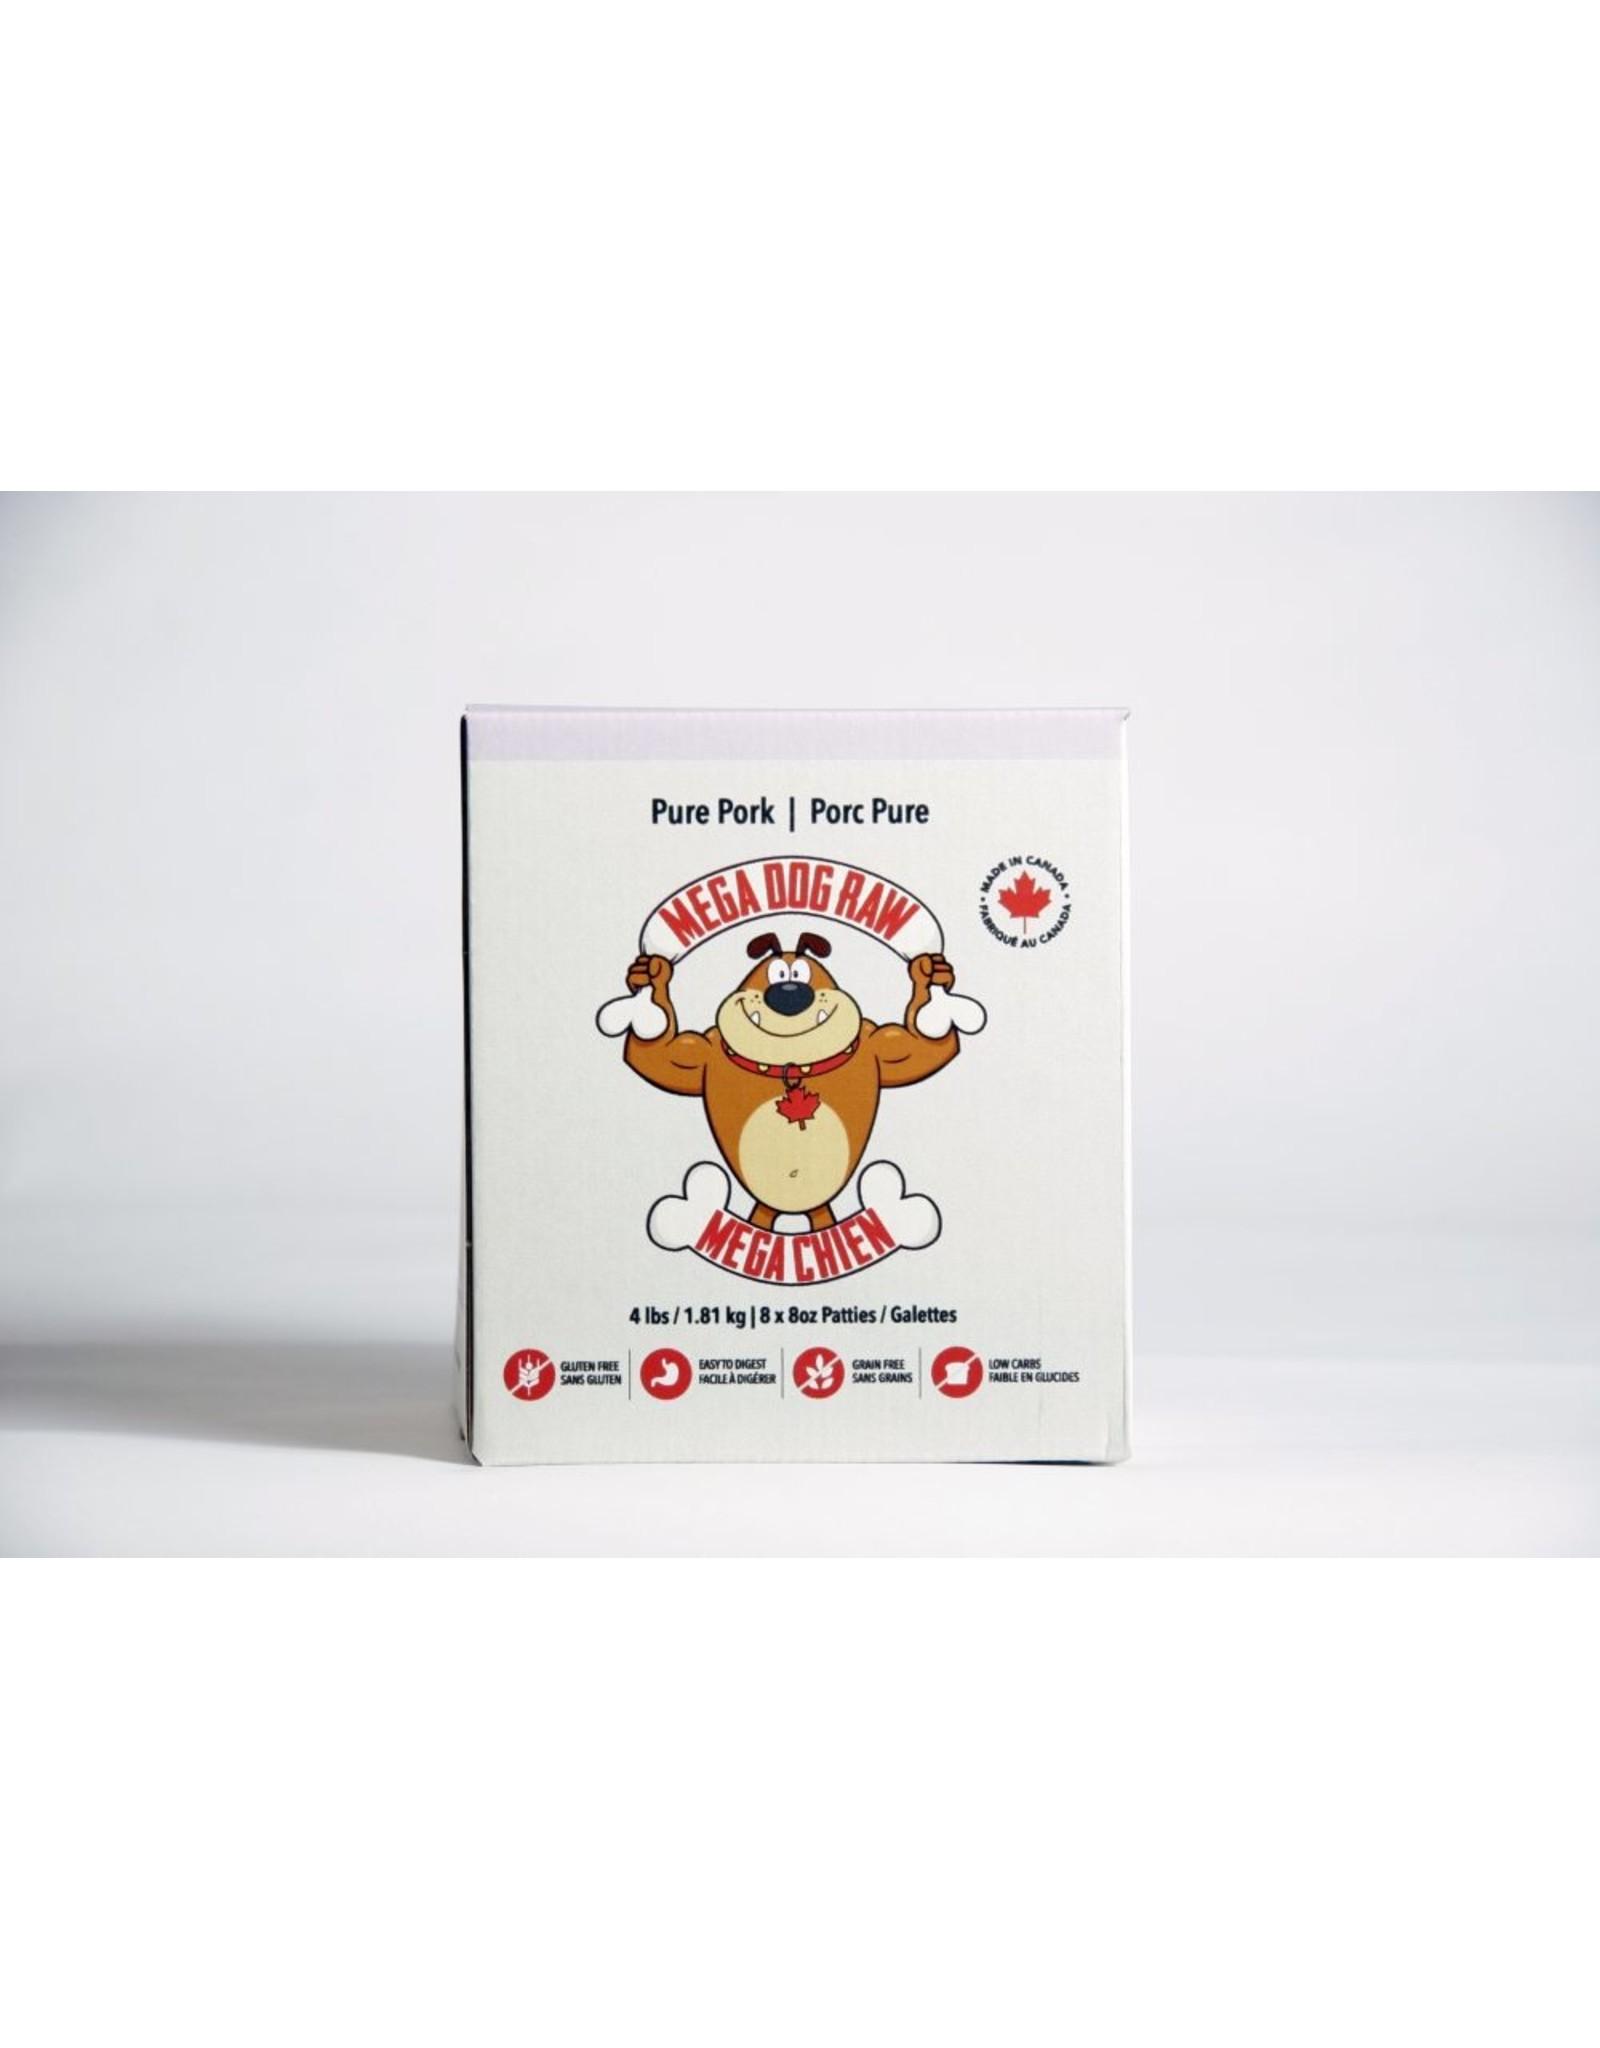 Mega Dog (FRZ) \ Mega Dog \ Pure Pork 4 lb Patties